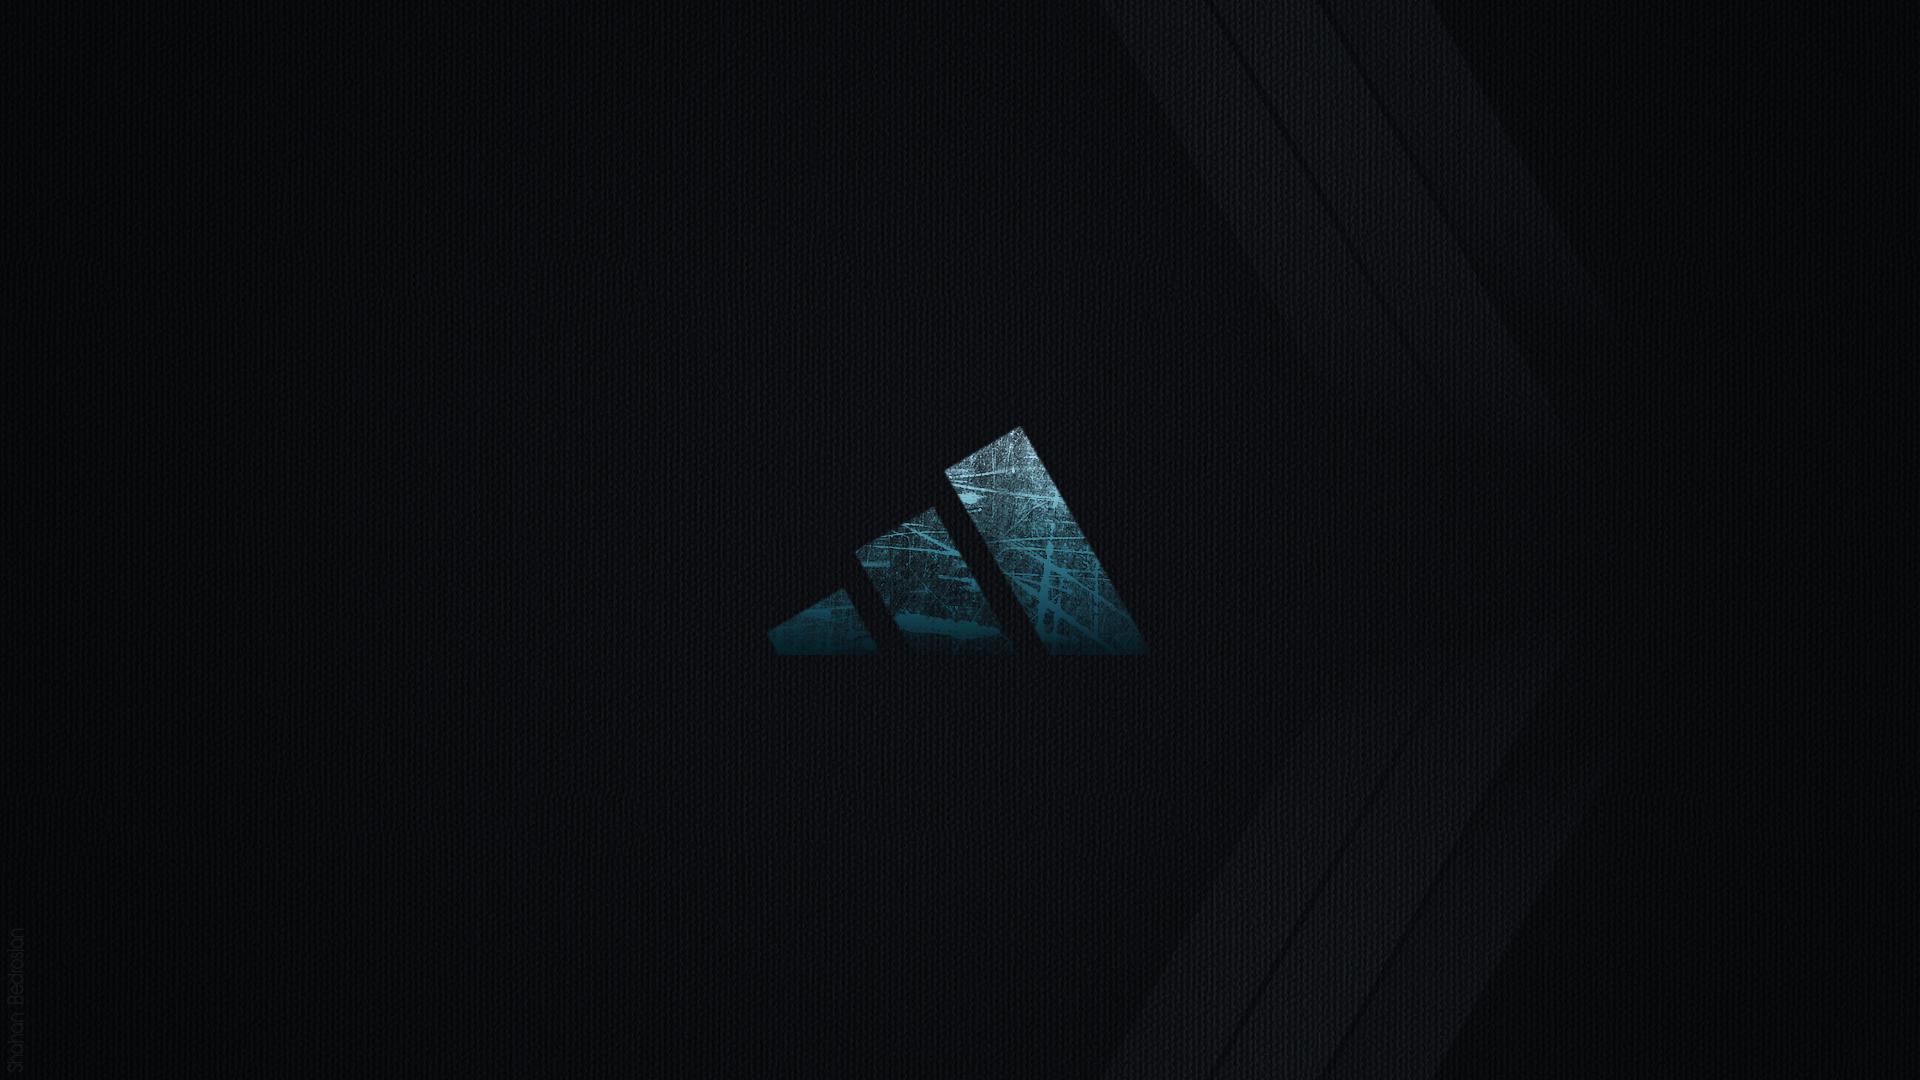 Dark Adidas Logo Wallpaper HD 1920x1080